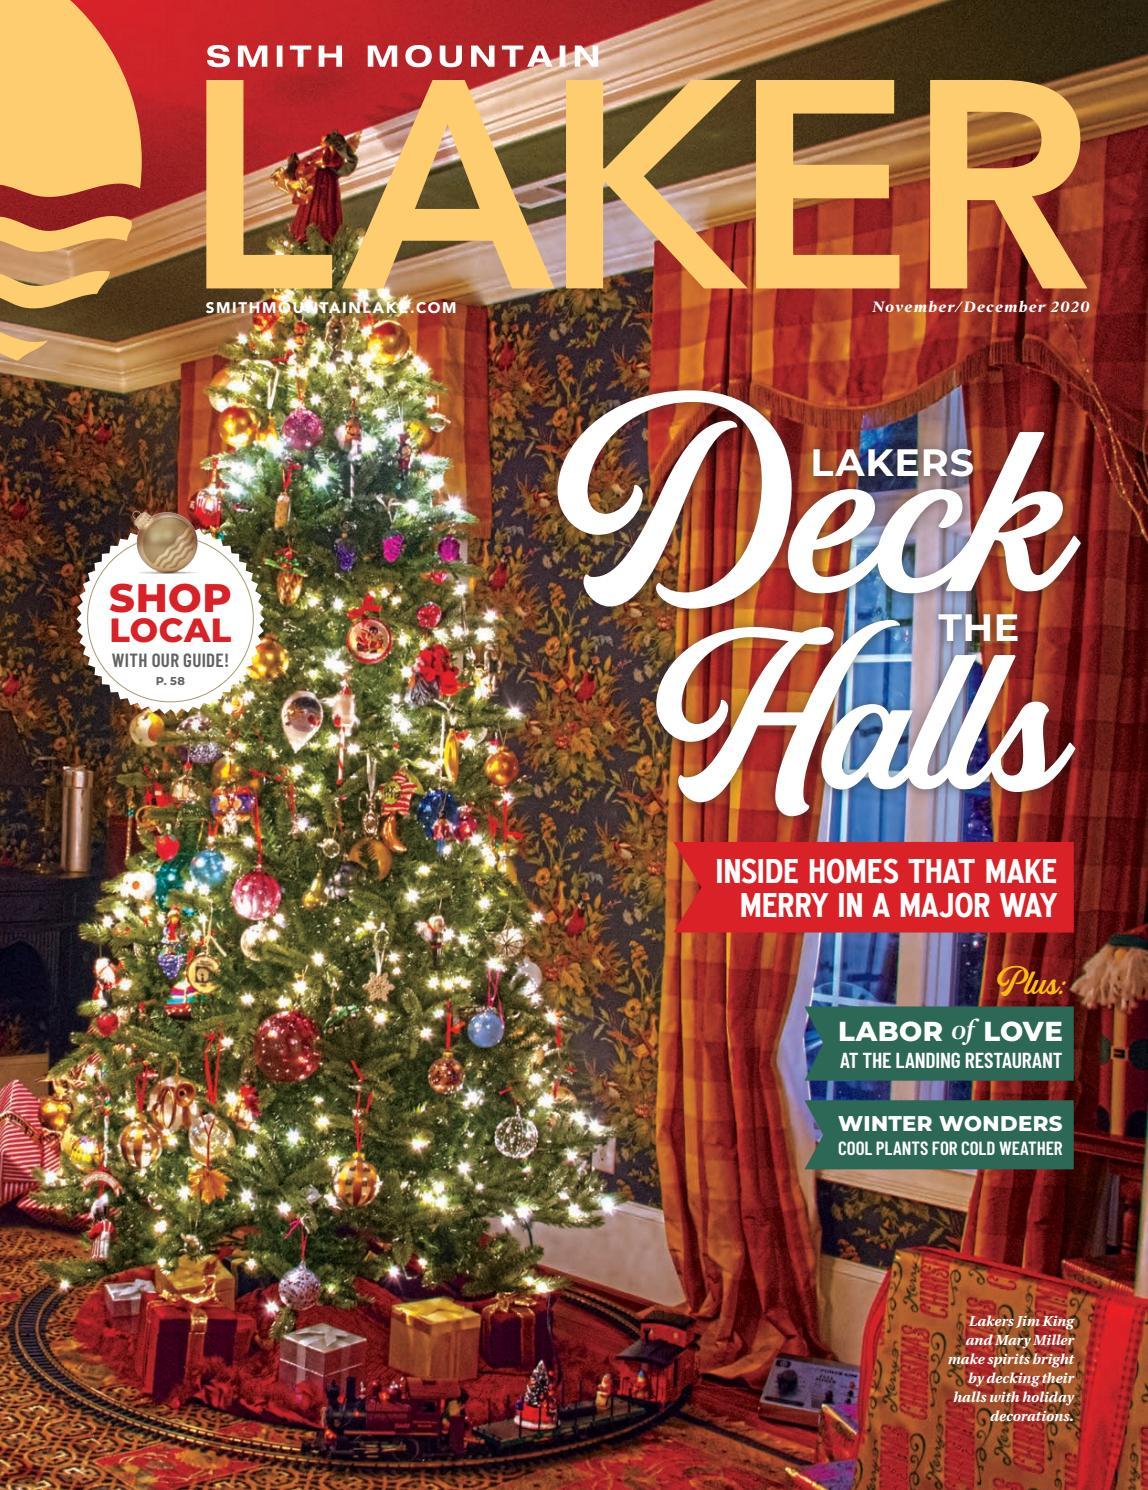 2020 November December Smith Mountain Laker magazine by